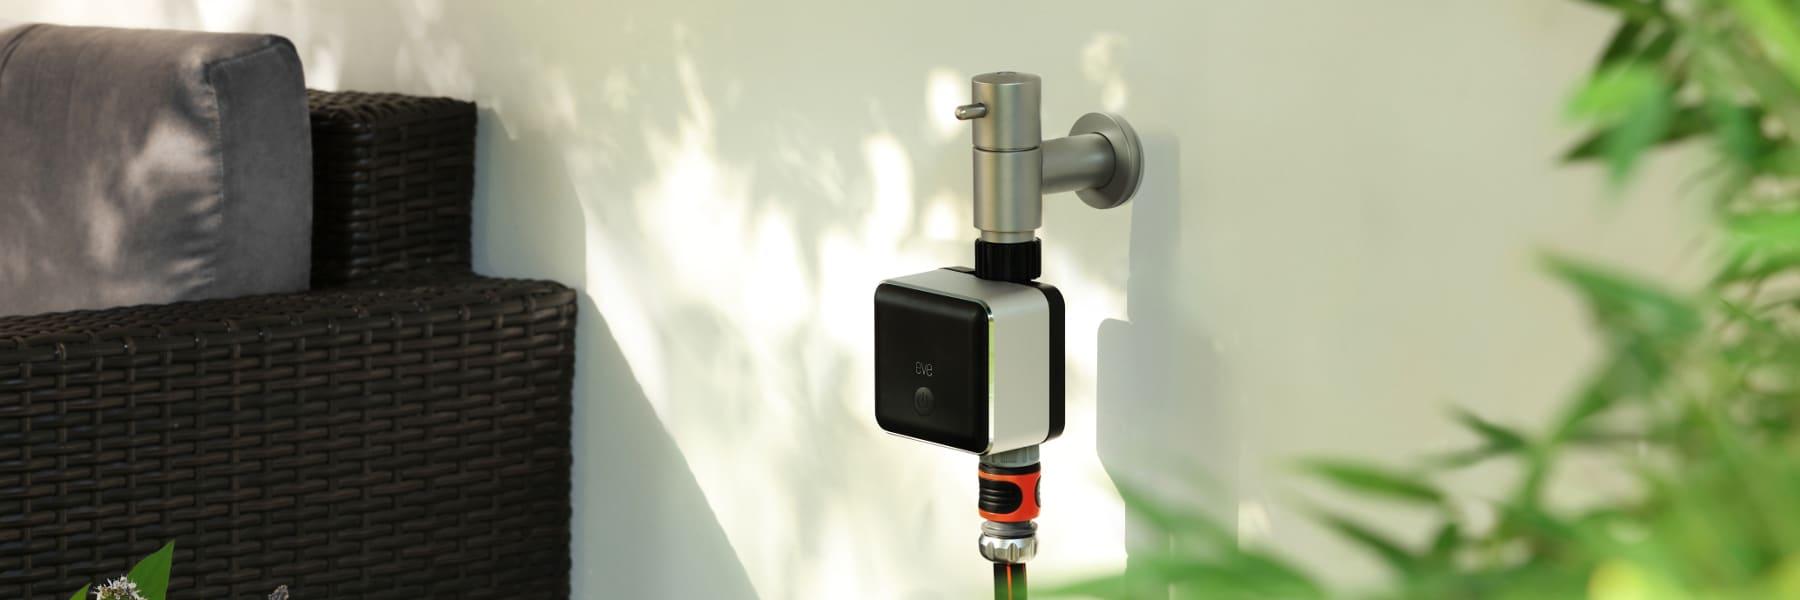 Elgato stellt neue HomeKit Geräte vor